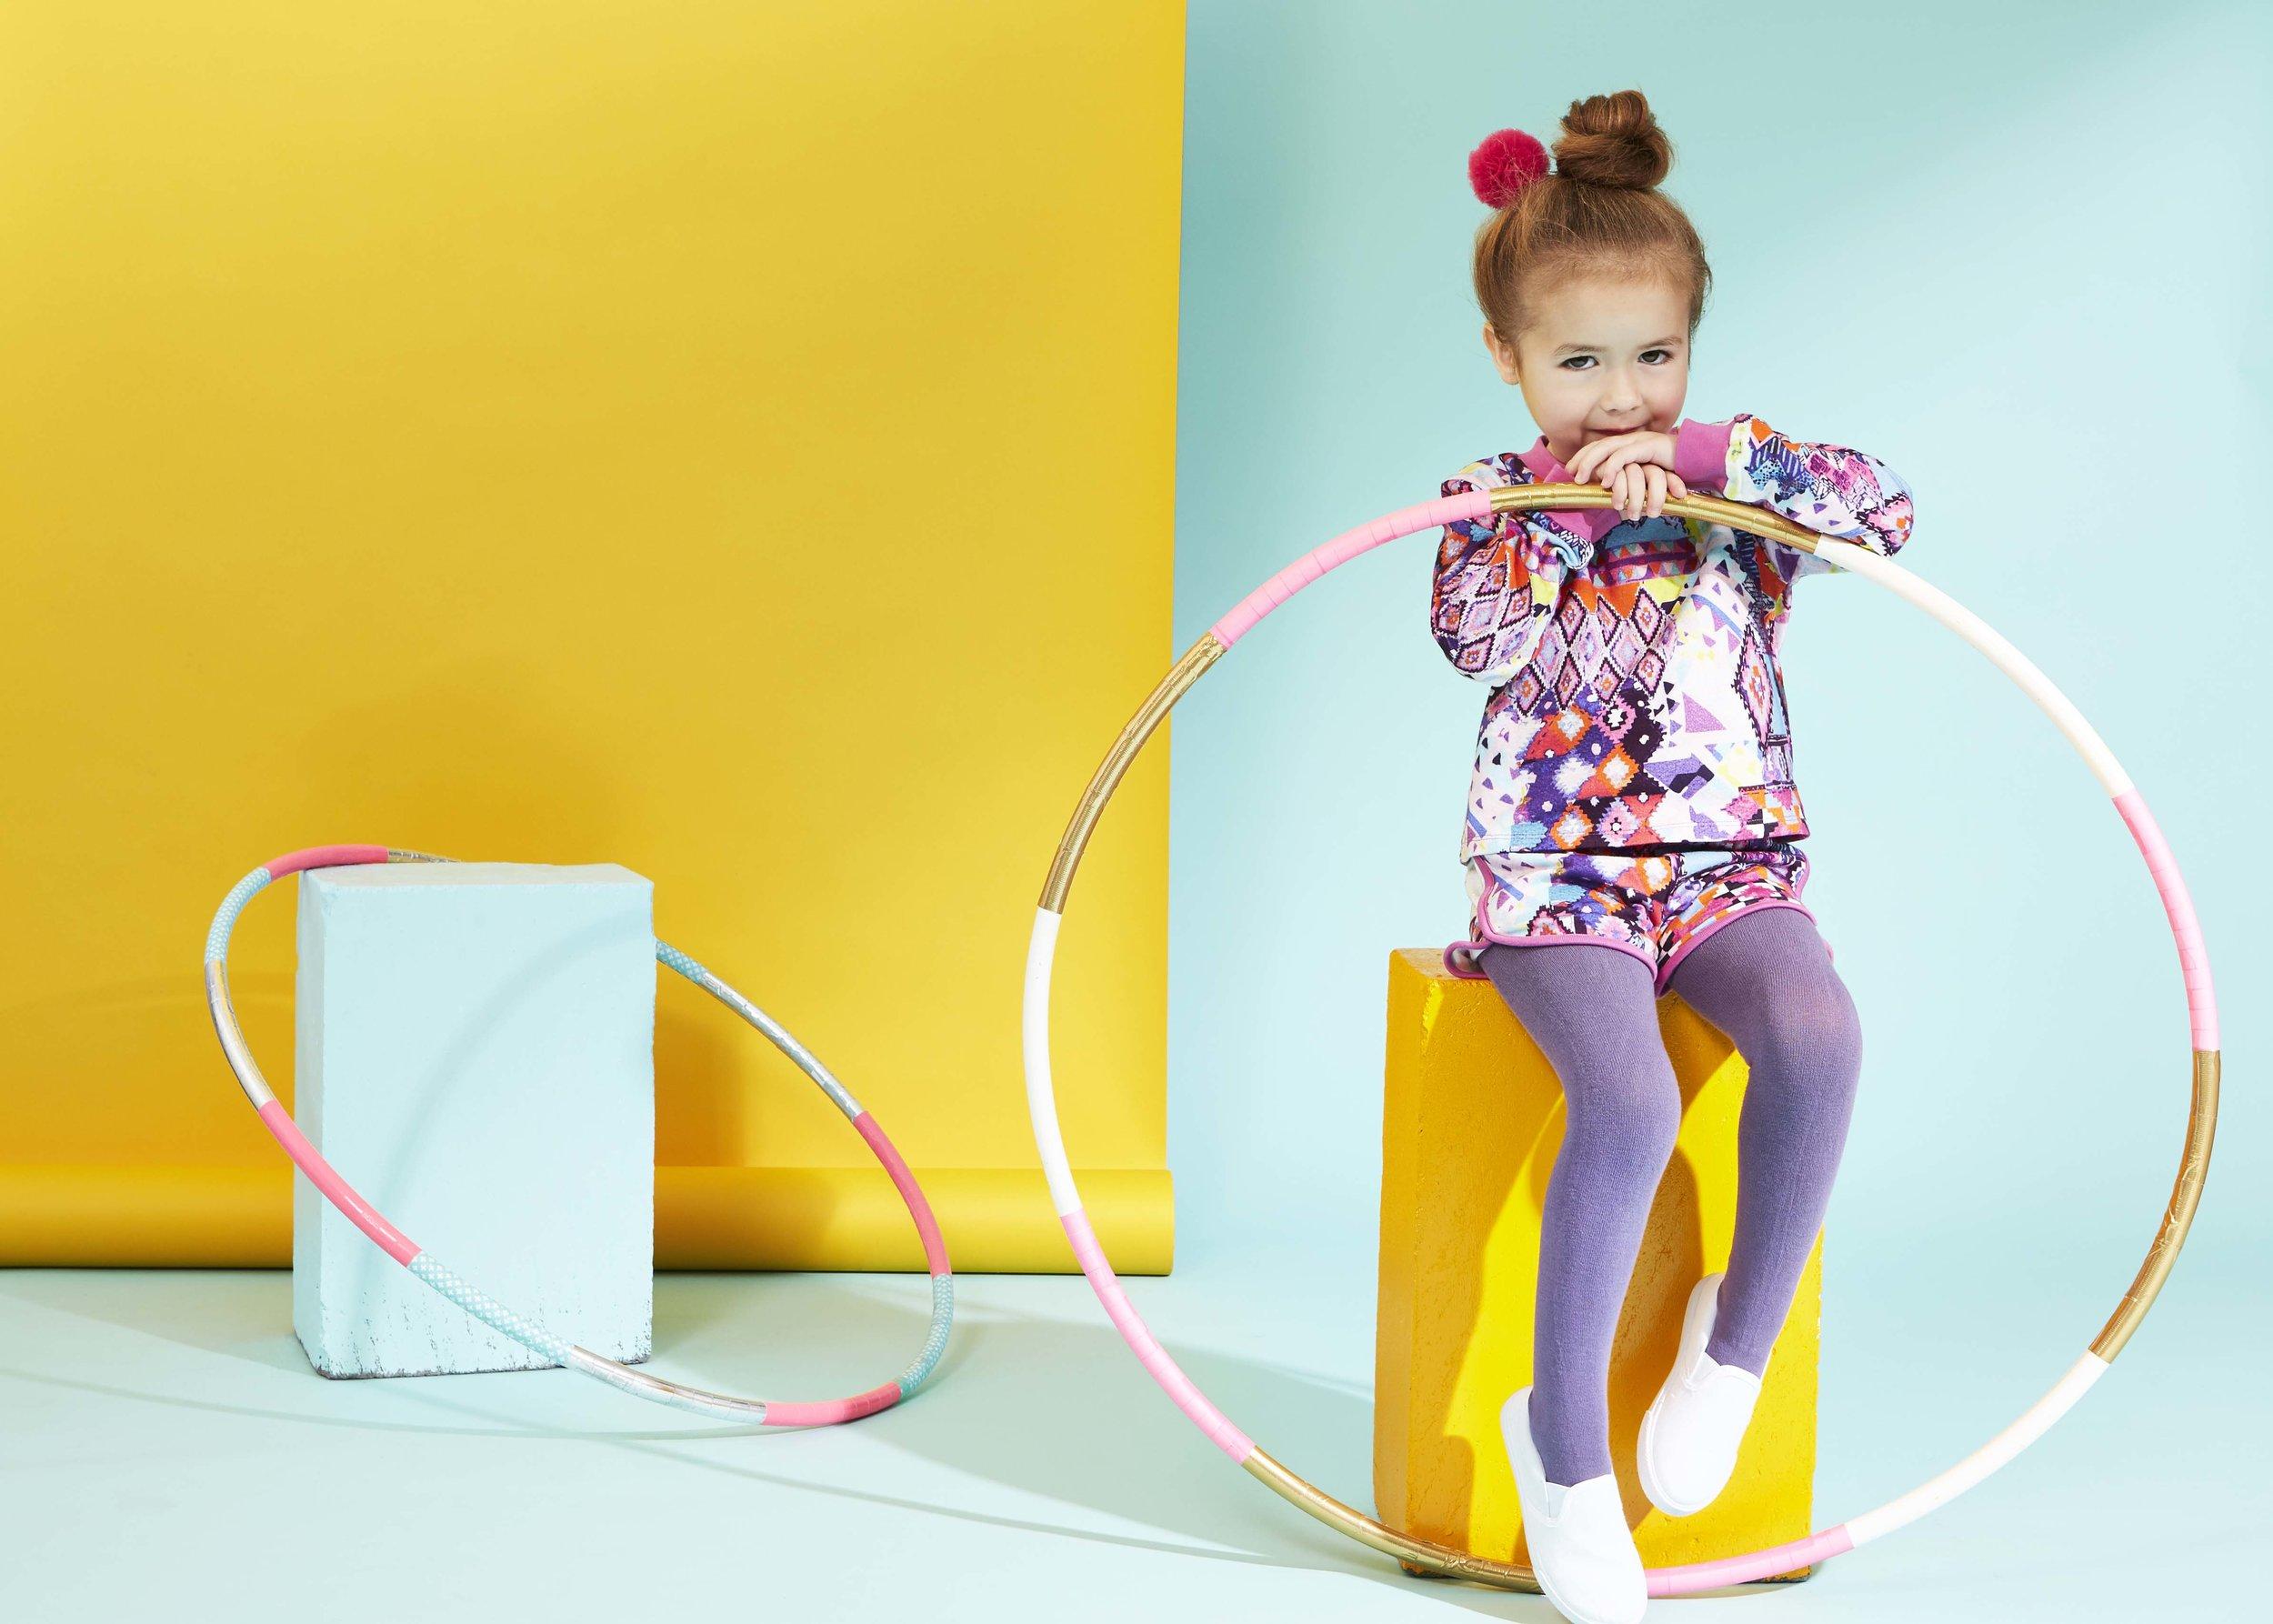 Liz_Cooper_Interior_Stylist_Styling_Kids_Fashion_Yellow_Colourblock_Parrots.jpg